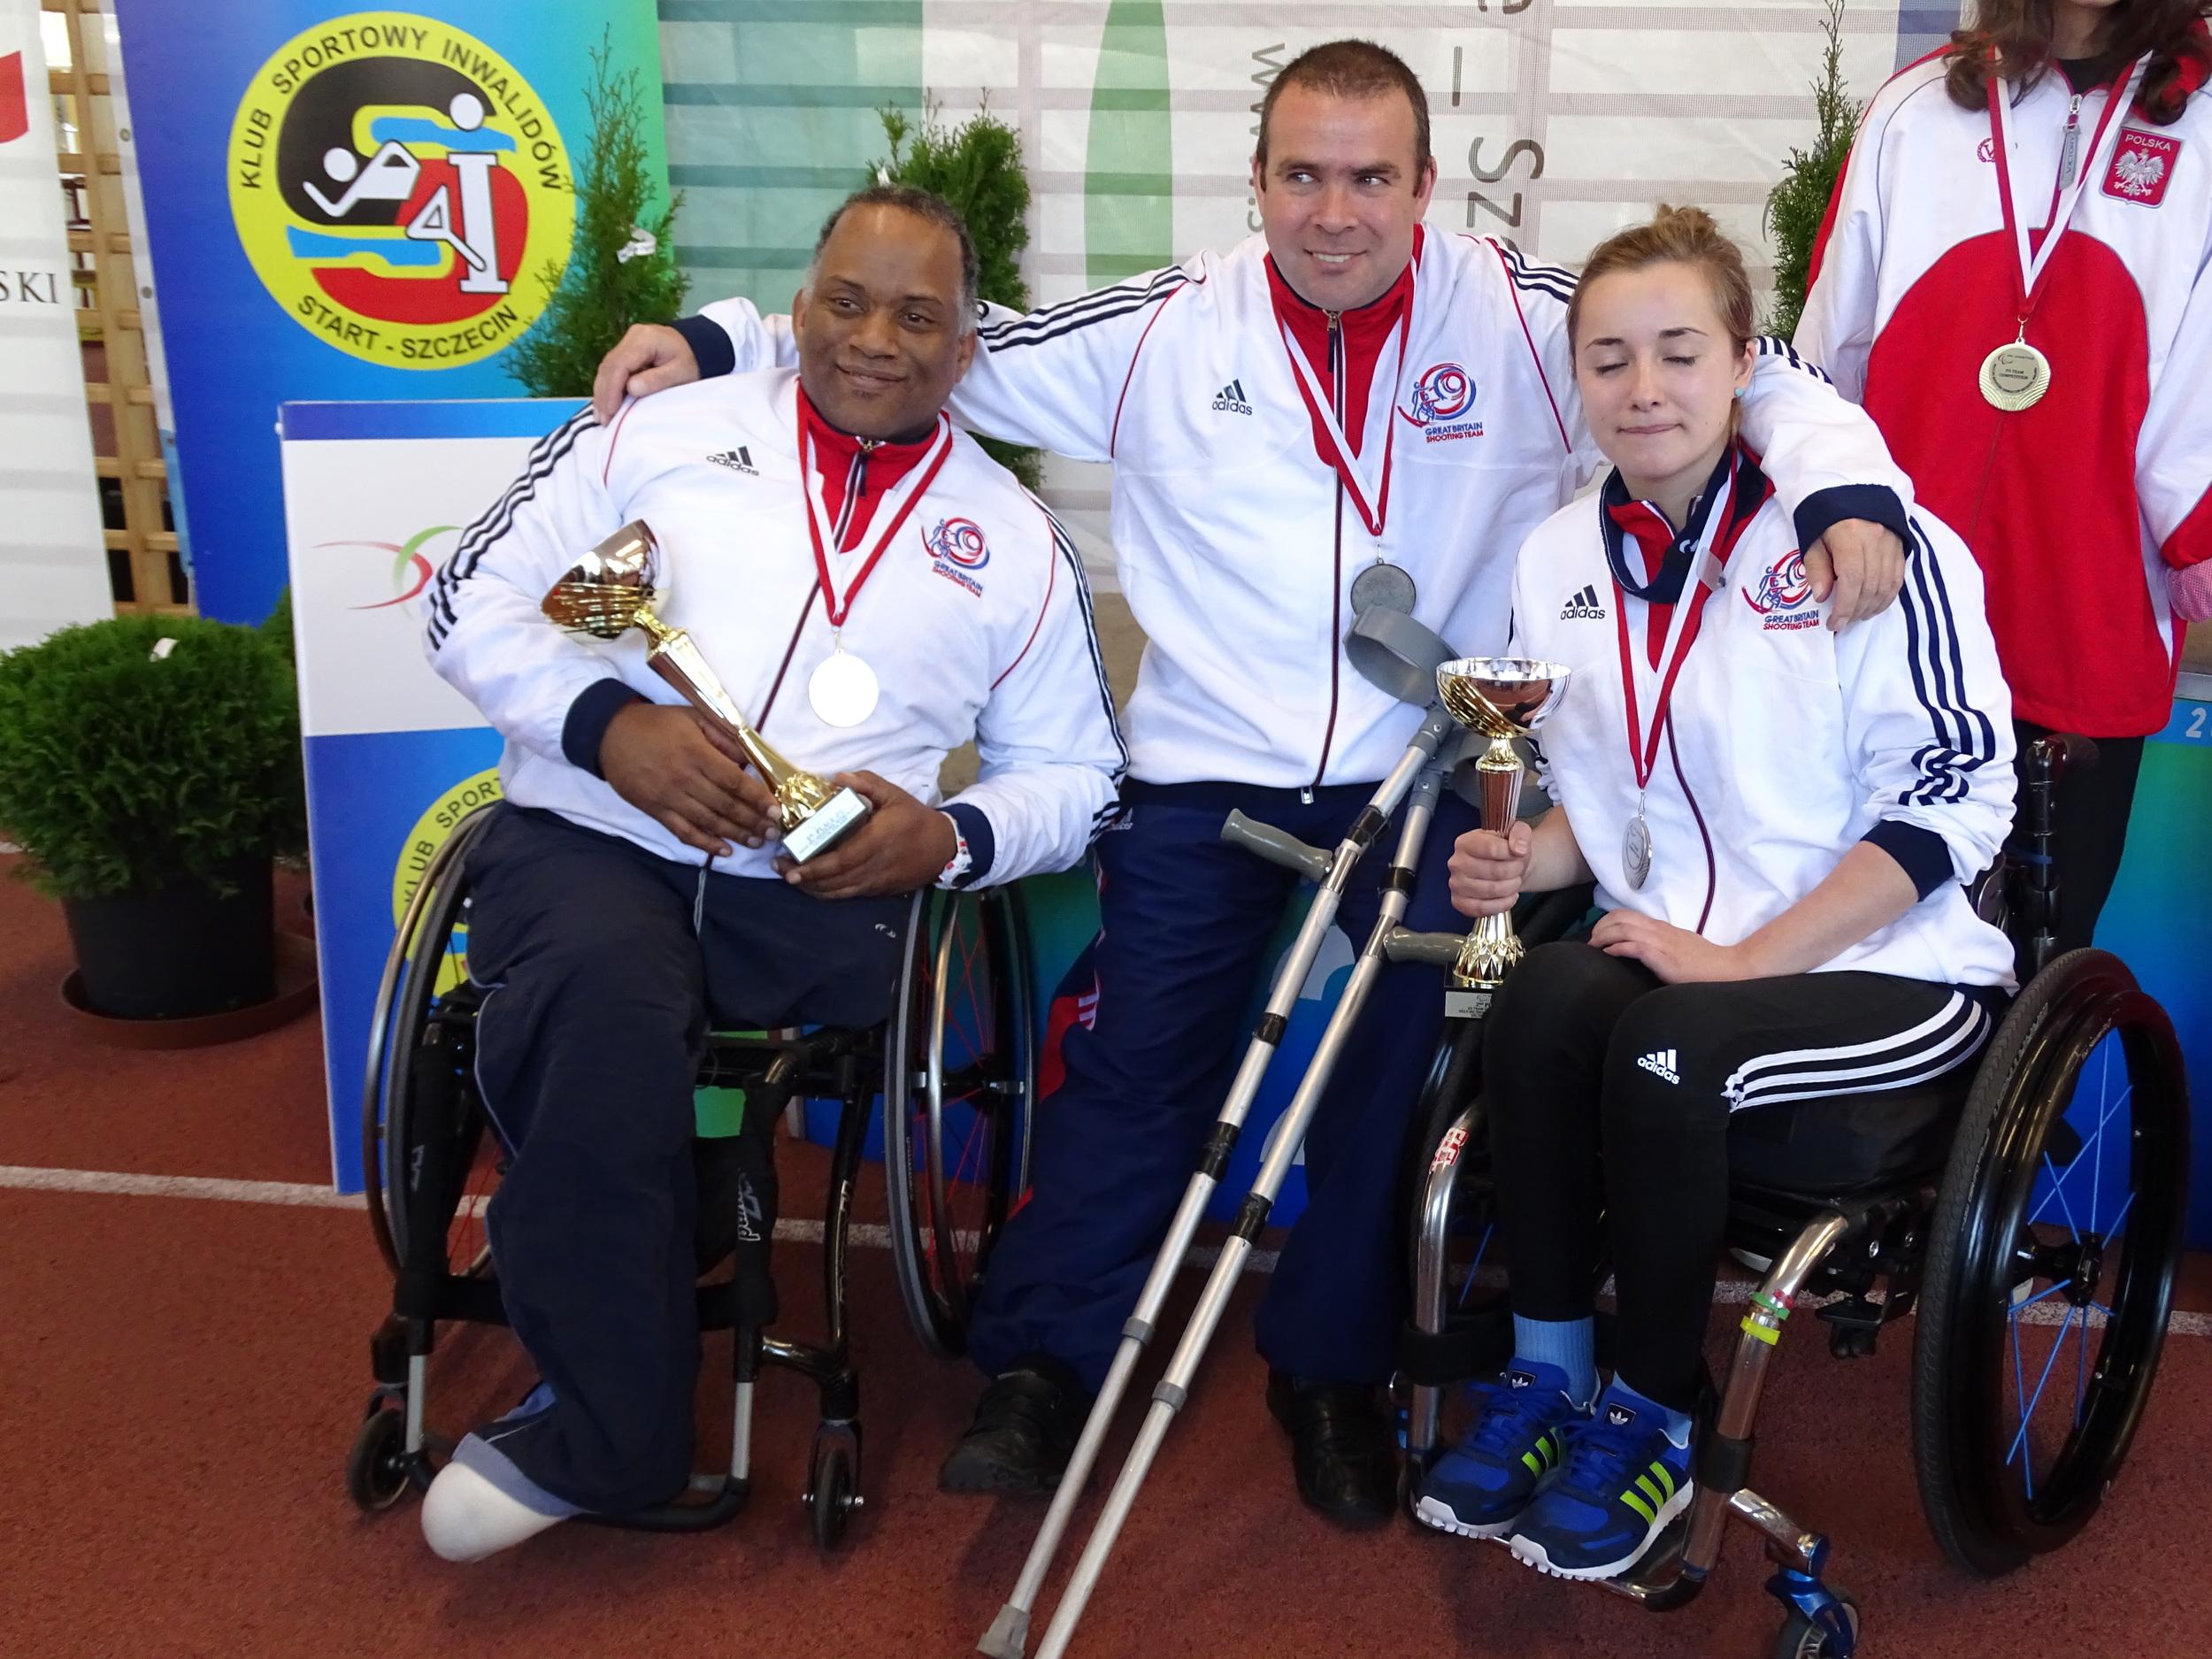 P5 Team Silver medallists (Carter, Nangle, Bailey)